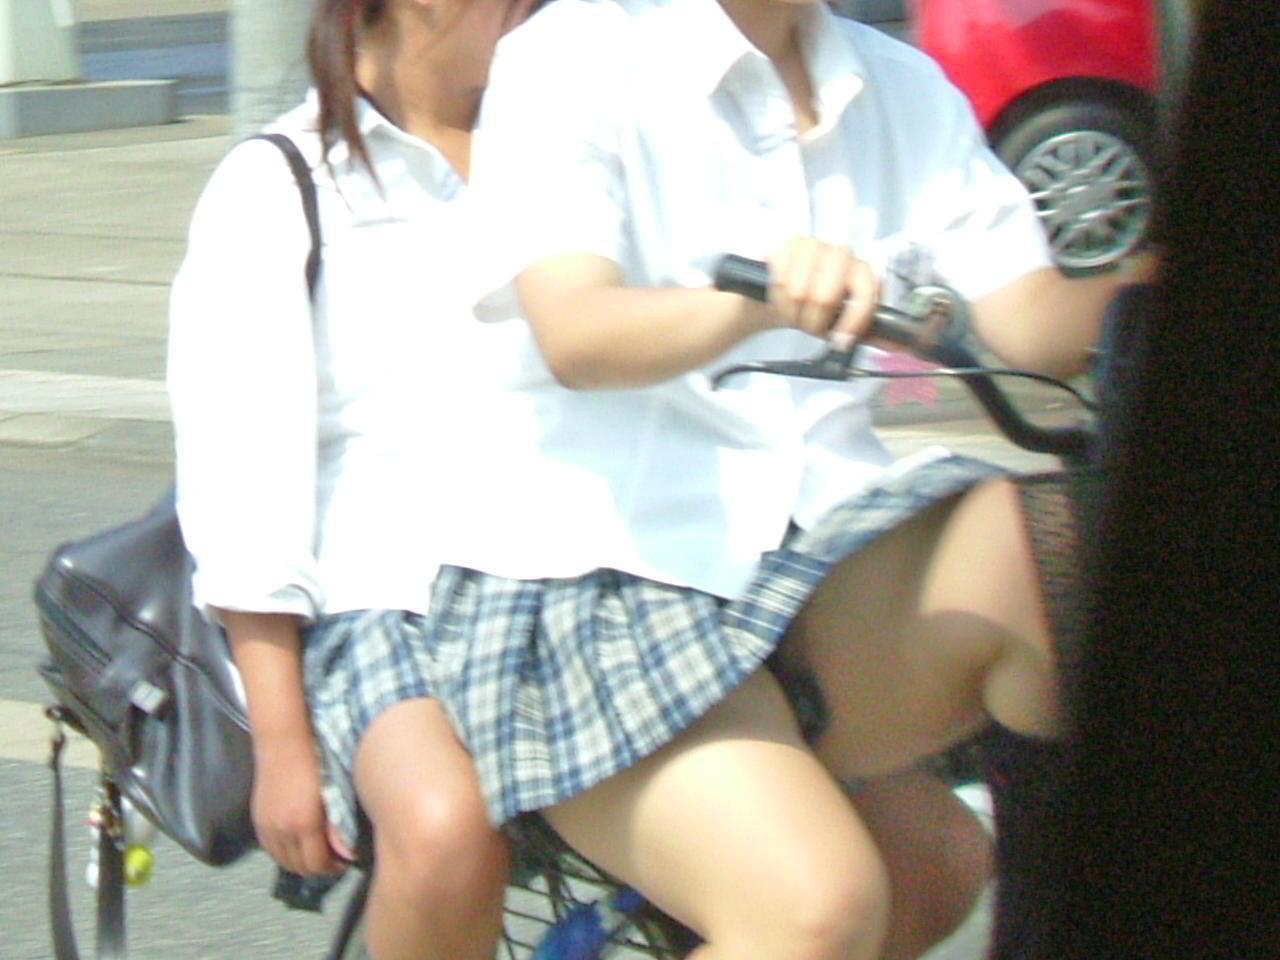 【JKパンチラ画像】通学途中のアクシデントwwwチャリンコ乗ったJKたちのパンチラ 09